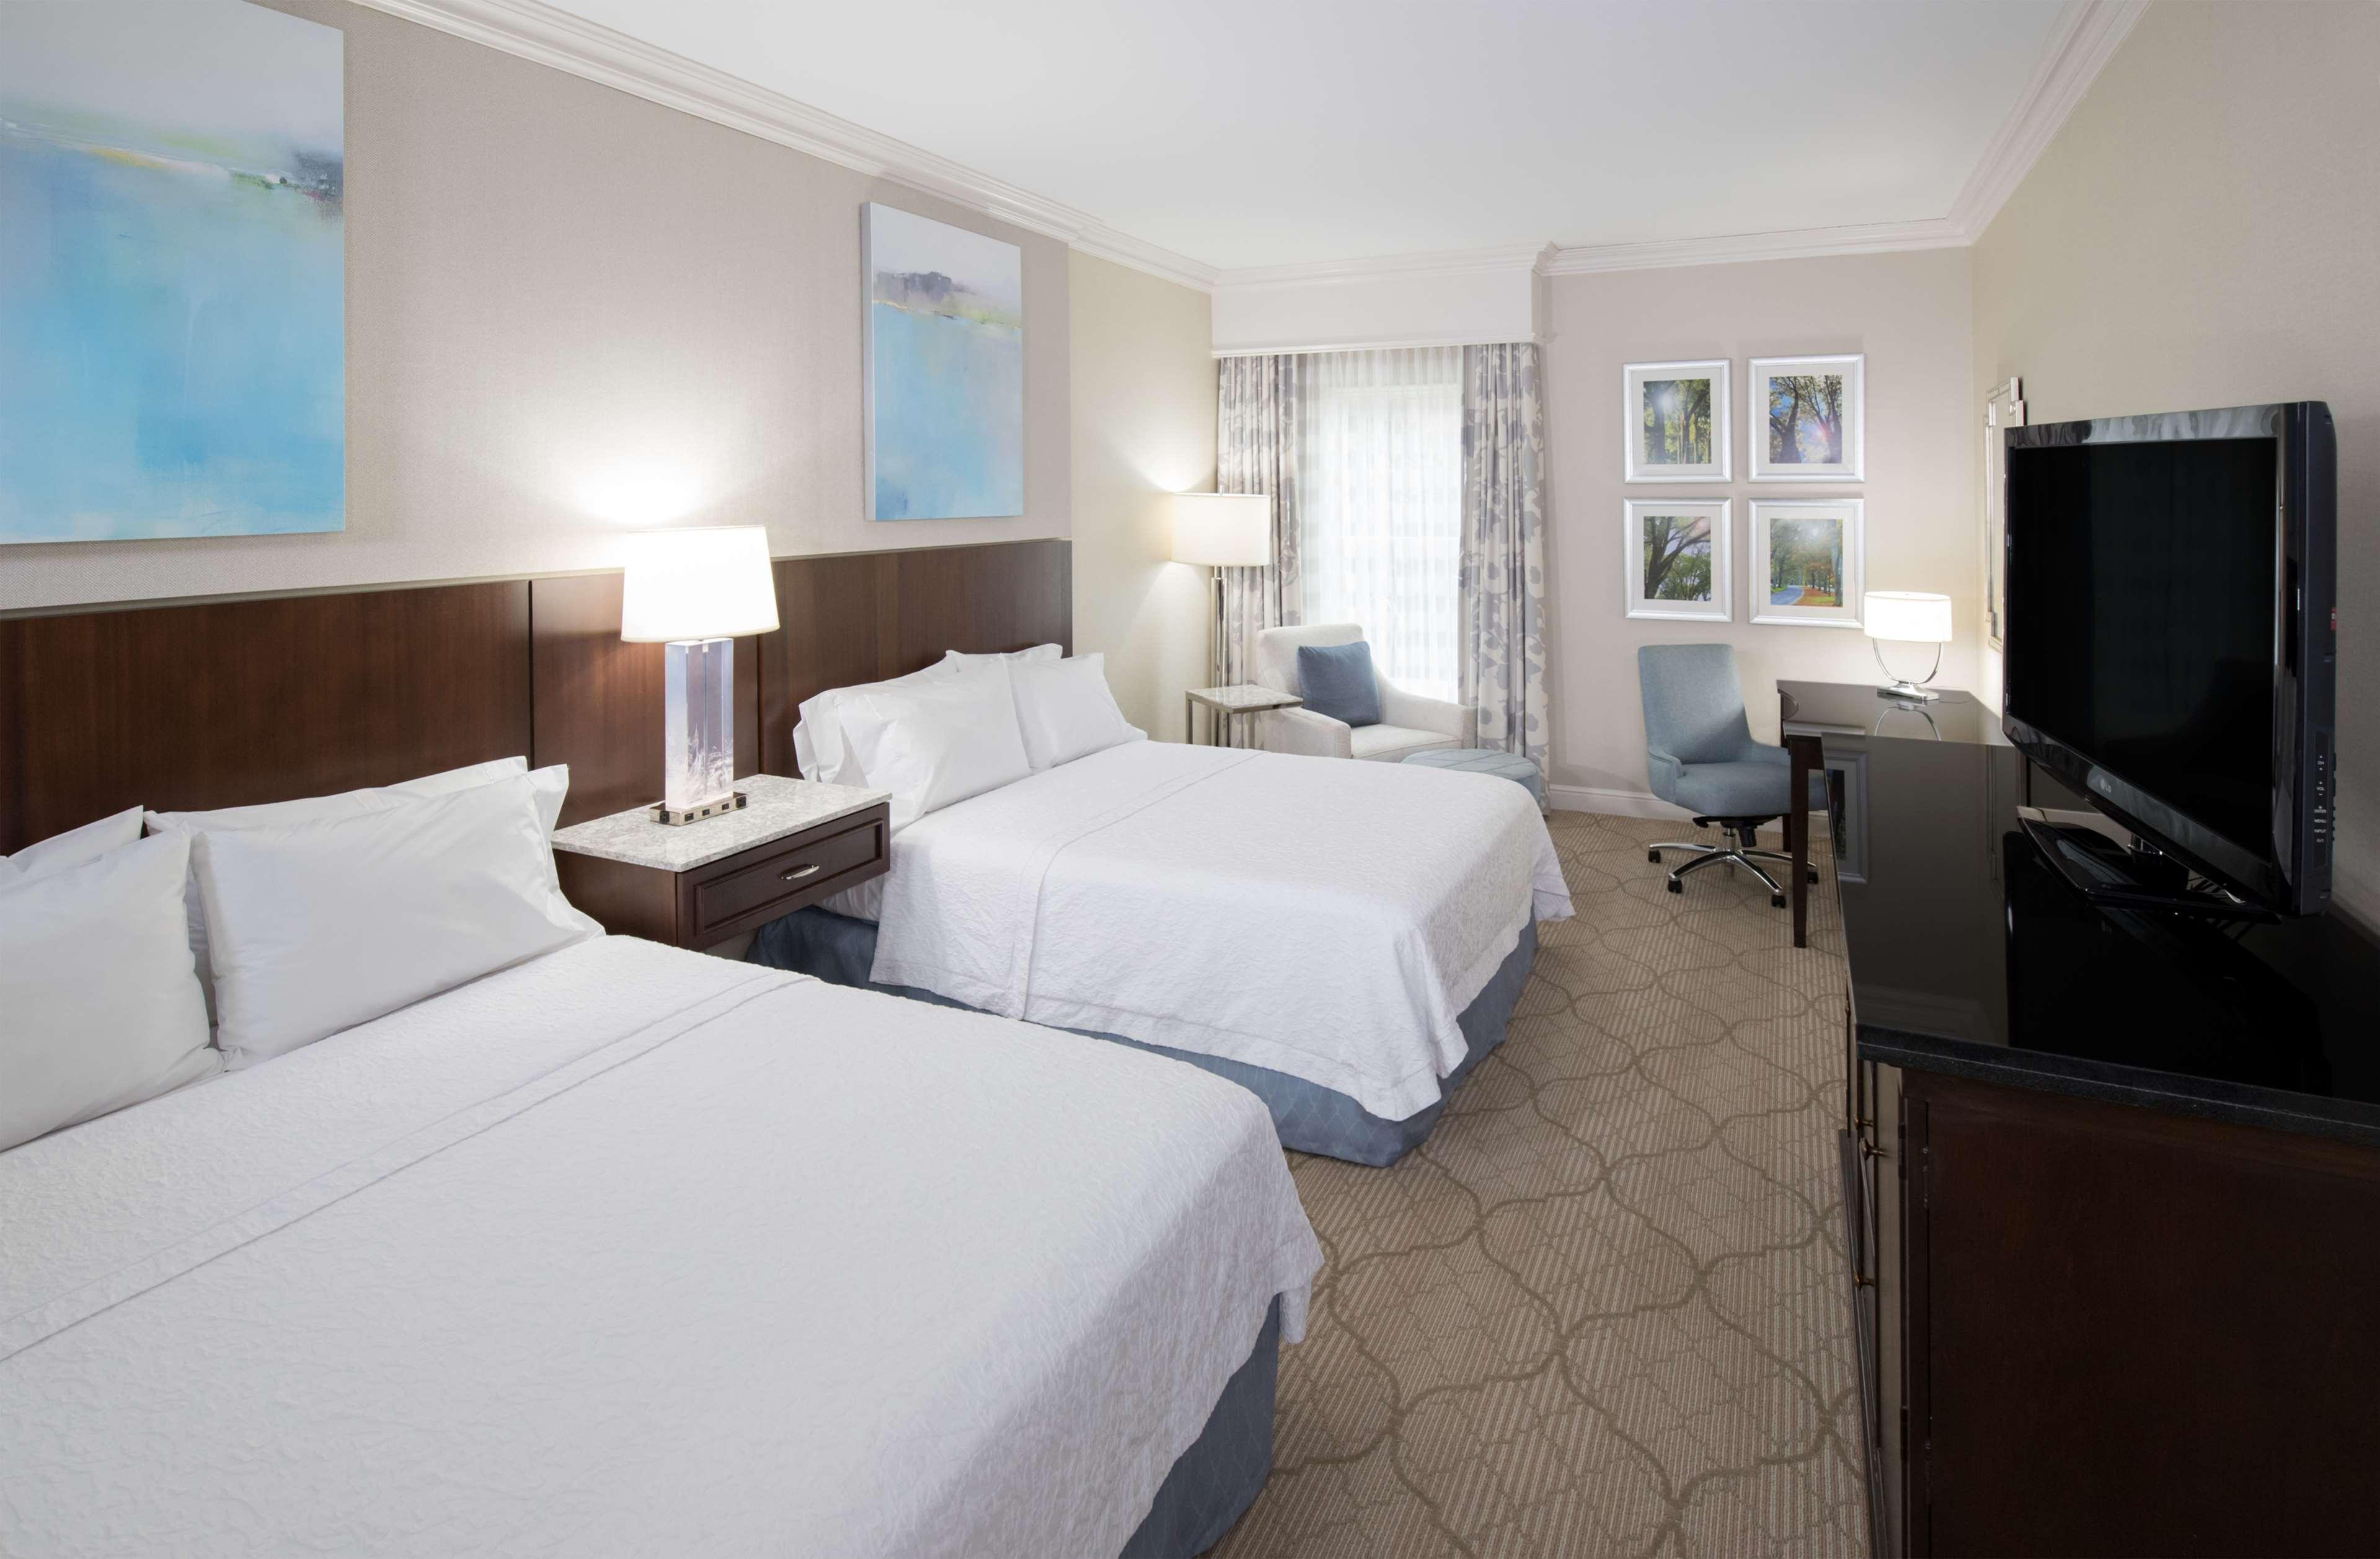 Hampton Inn & Suites Charlotte/South Park at Phillips Place image 36